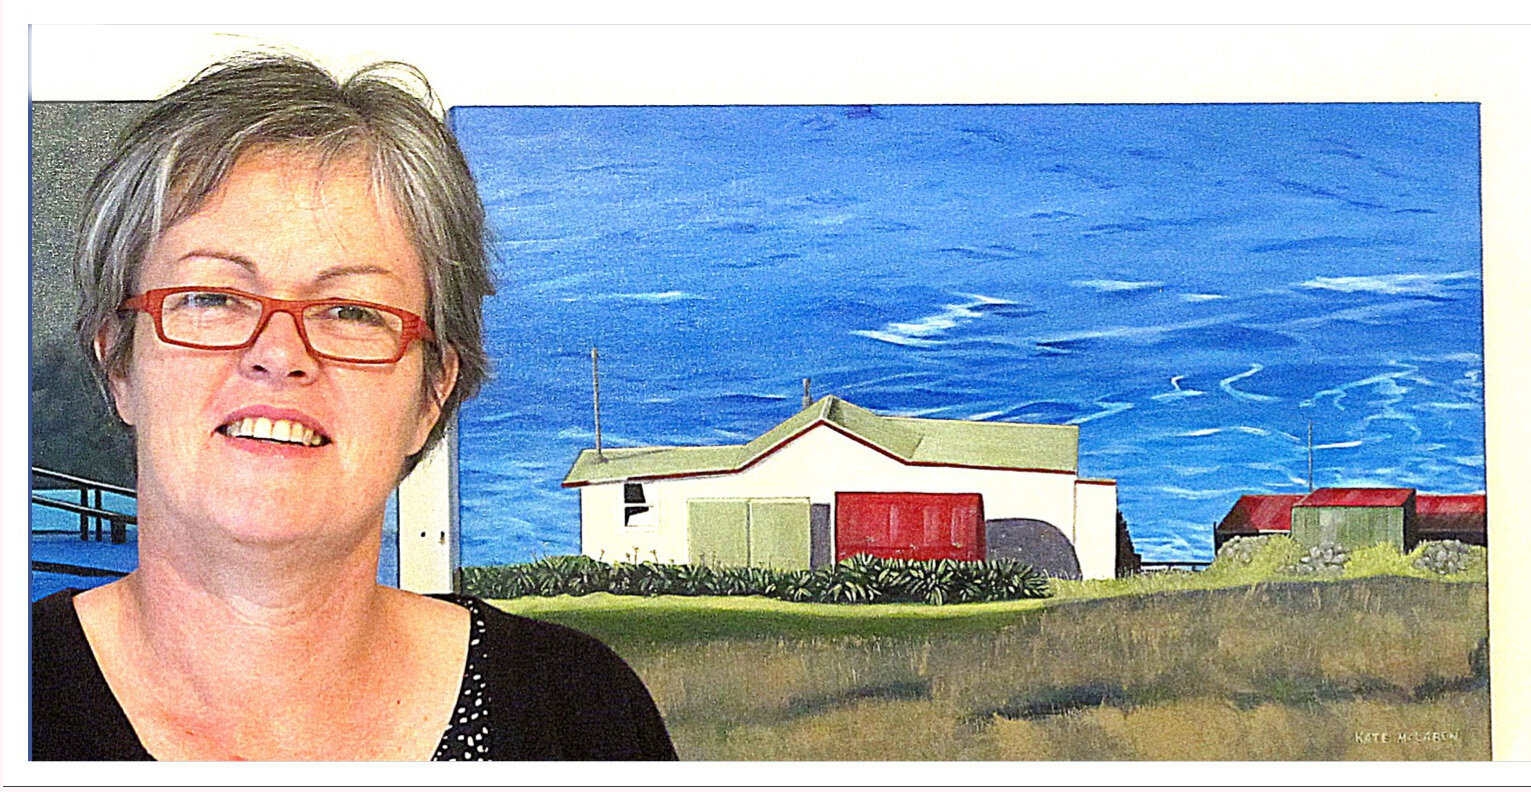 KATE McLAREN - New Zealand Landscape Artist